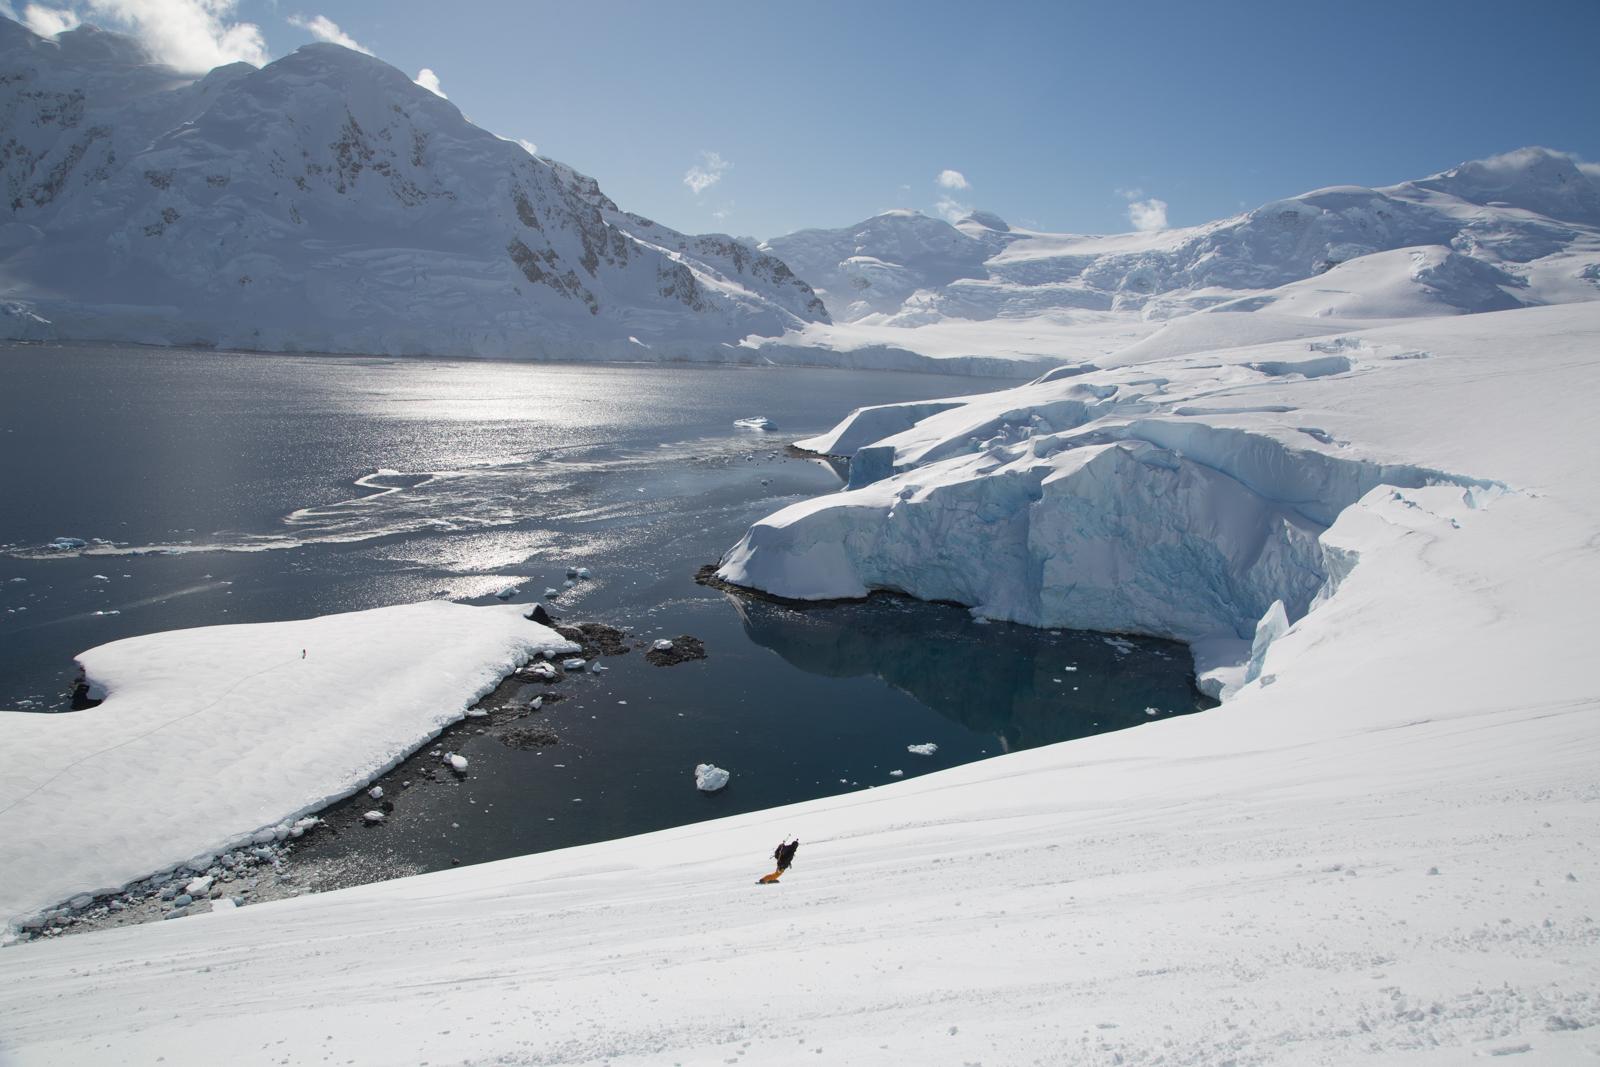 Antarctic Peninsula Adventure Cruise 2014 - Ice Axe Expeditions